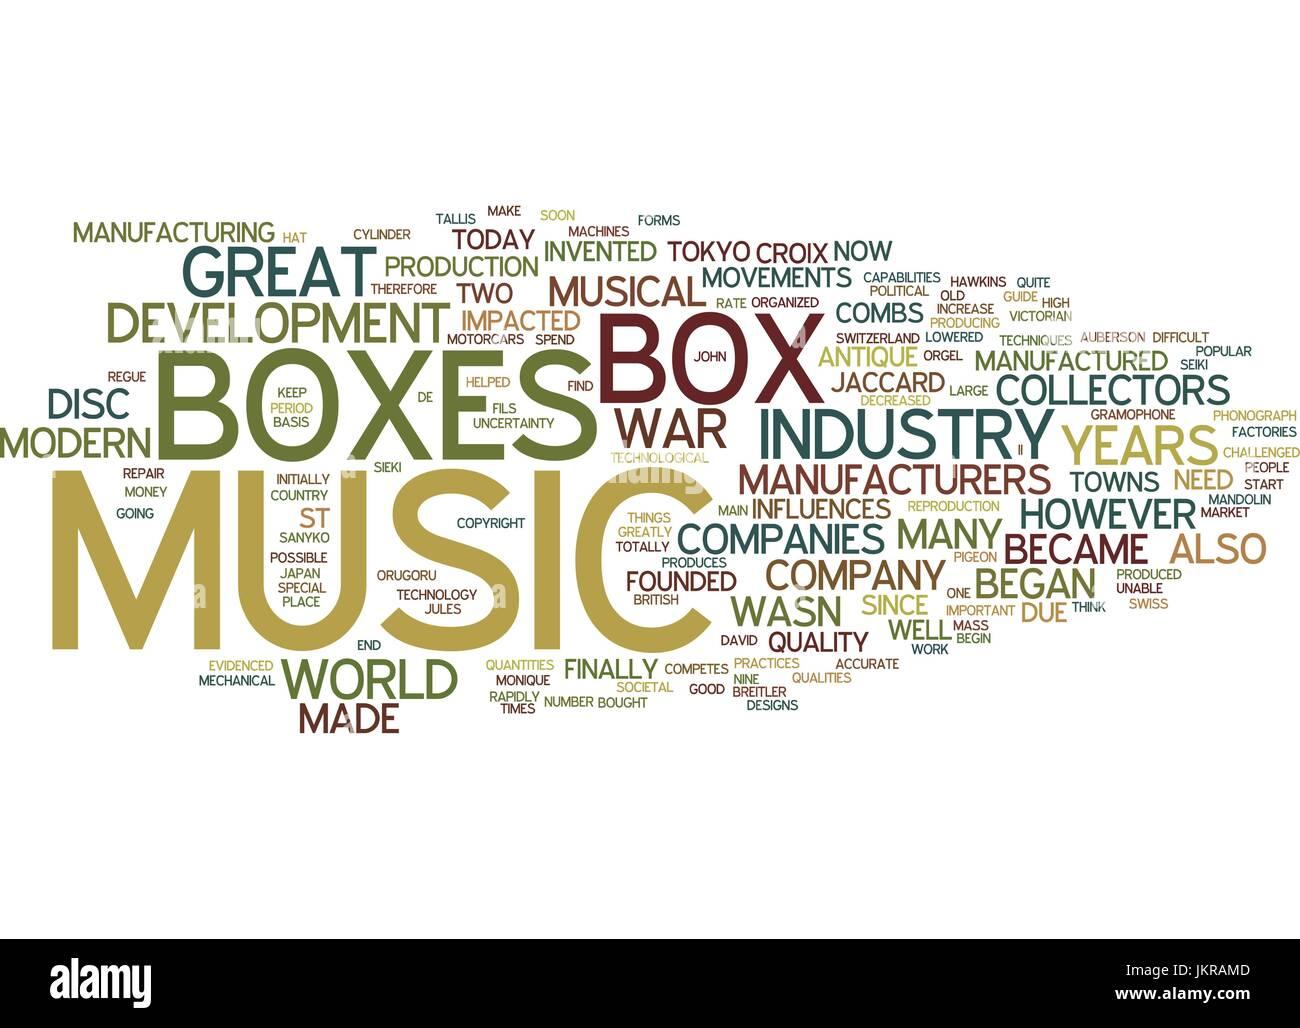 cylinder music box stock photos cylinder music box stock images